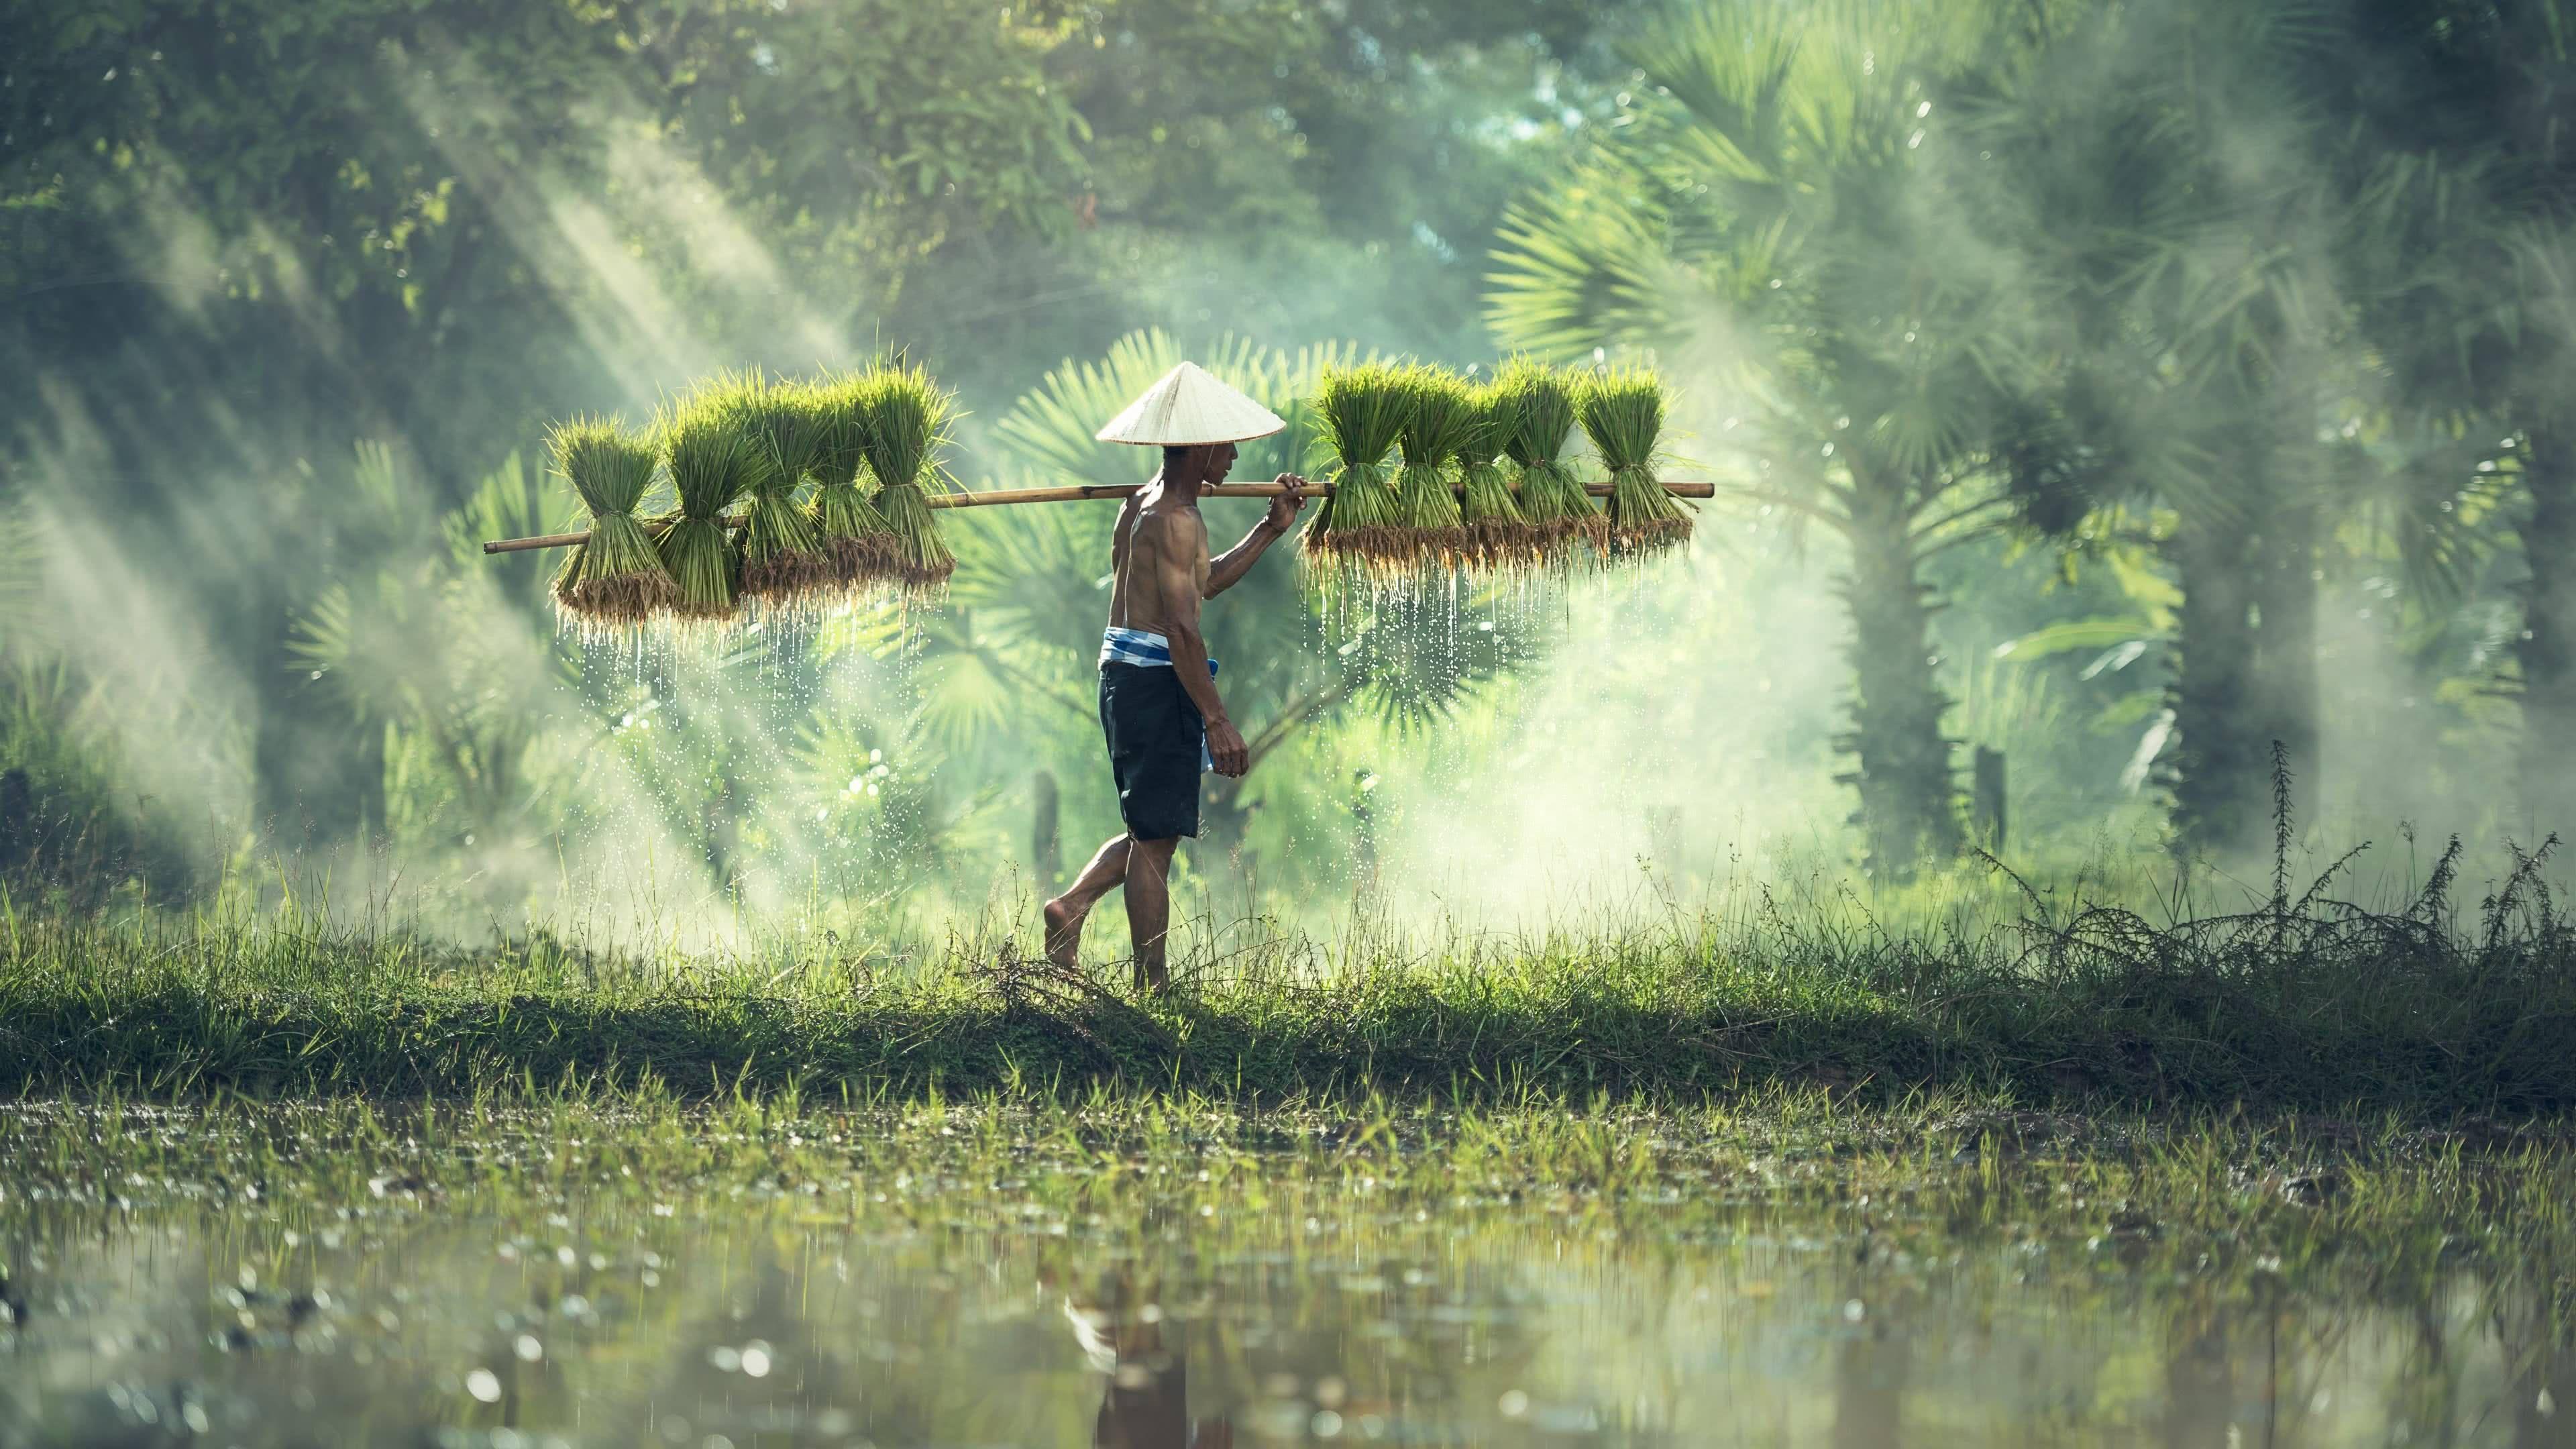 4k uhd cambodian rice farmer wallpaper Vit nam Vit Chu 3840x2160